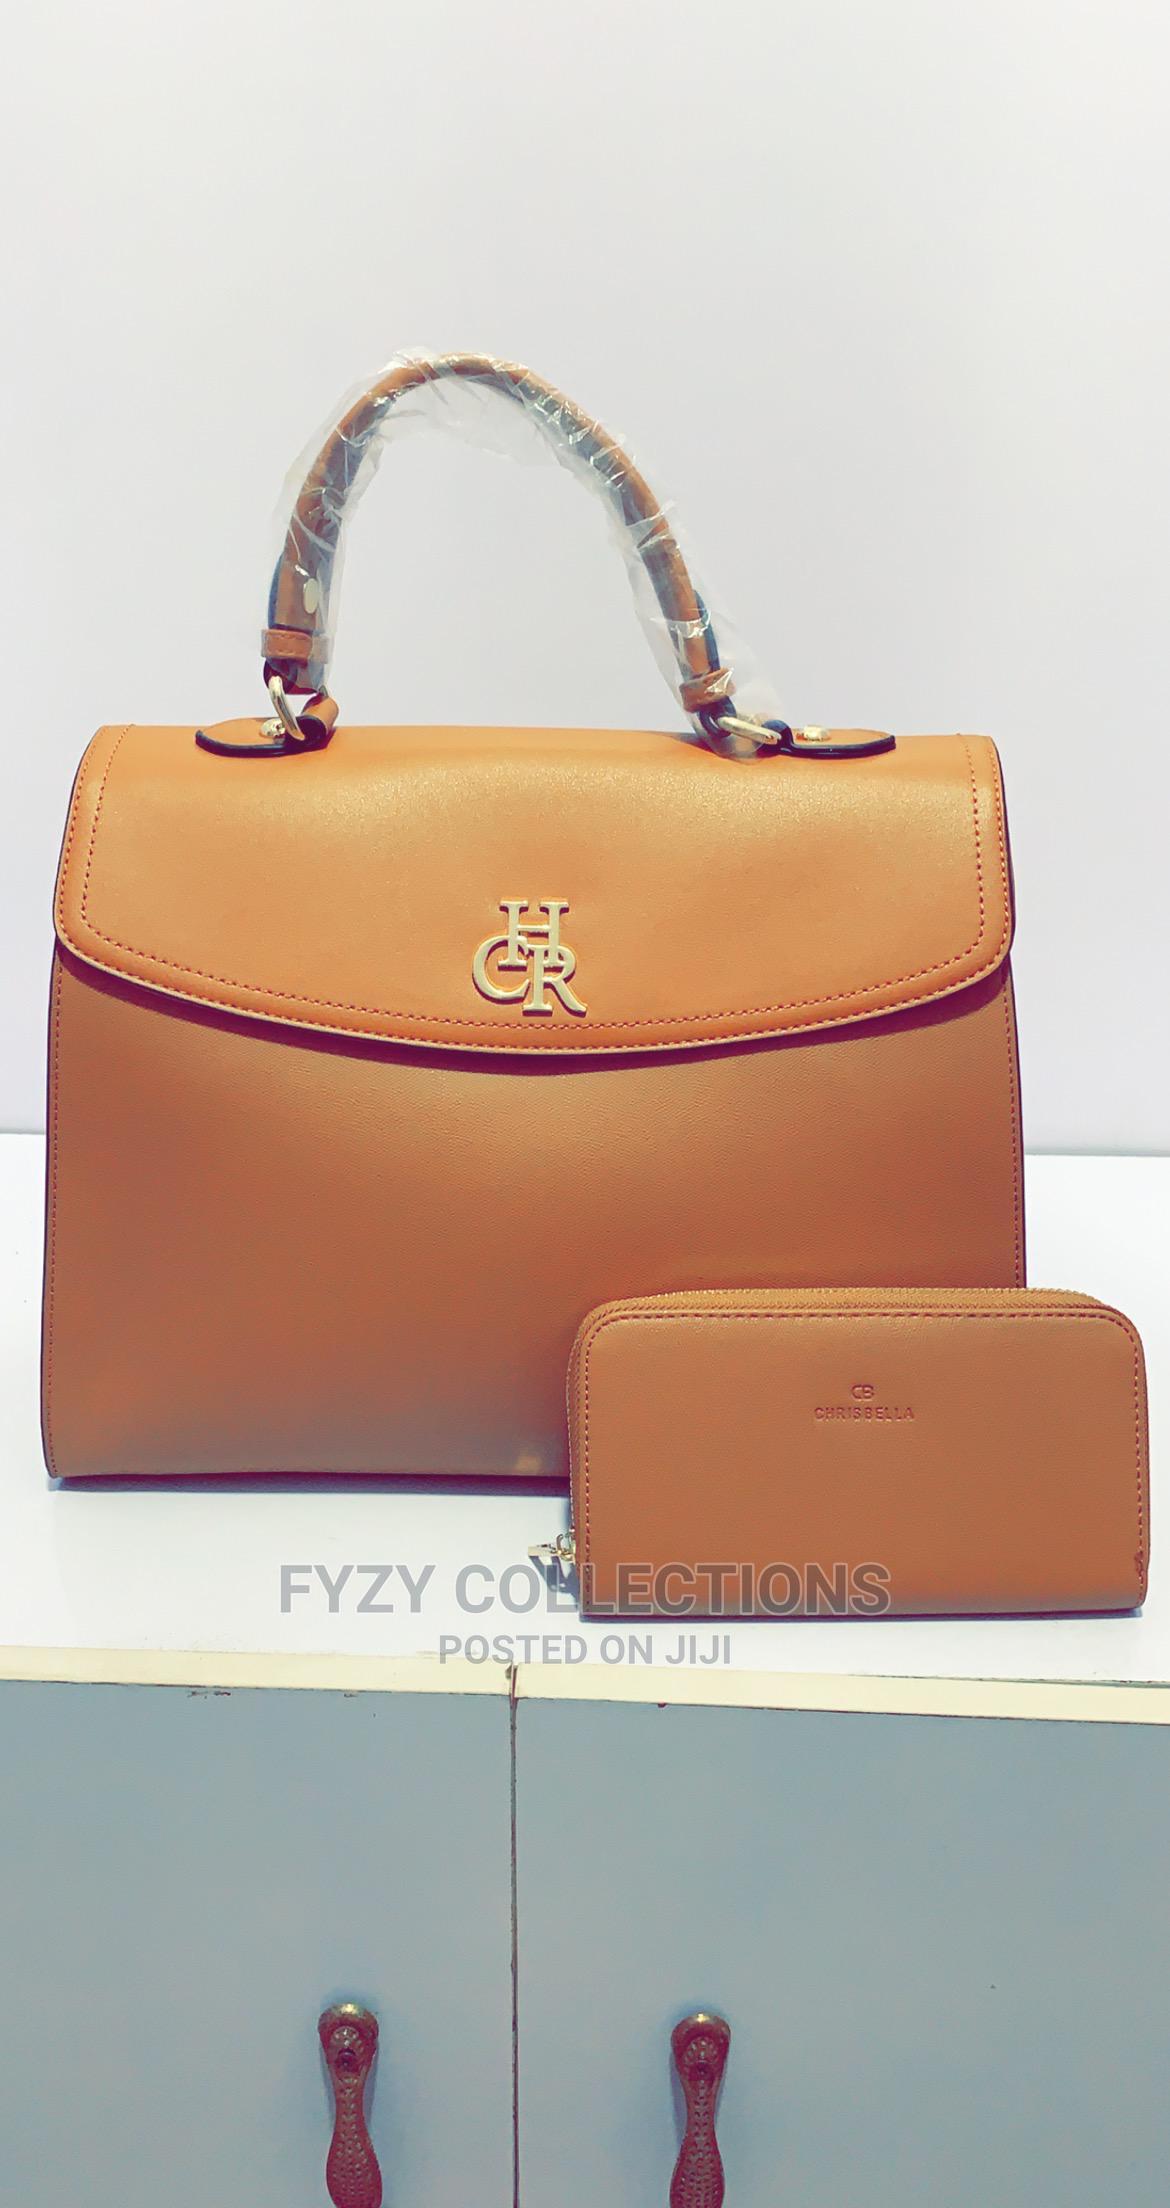 Archive: High Quality Chrisbella Handbag